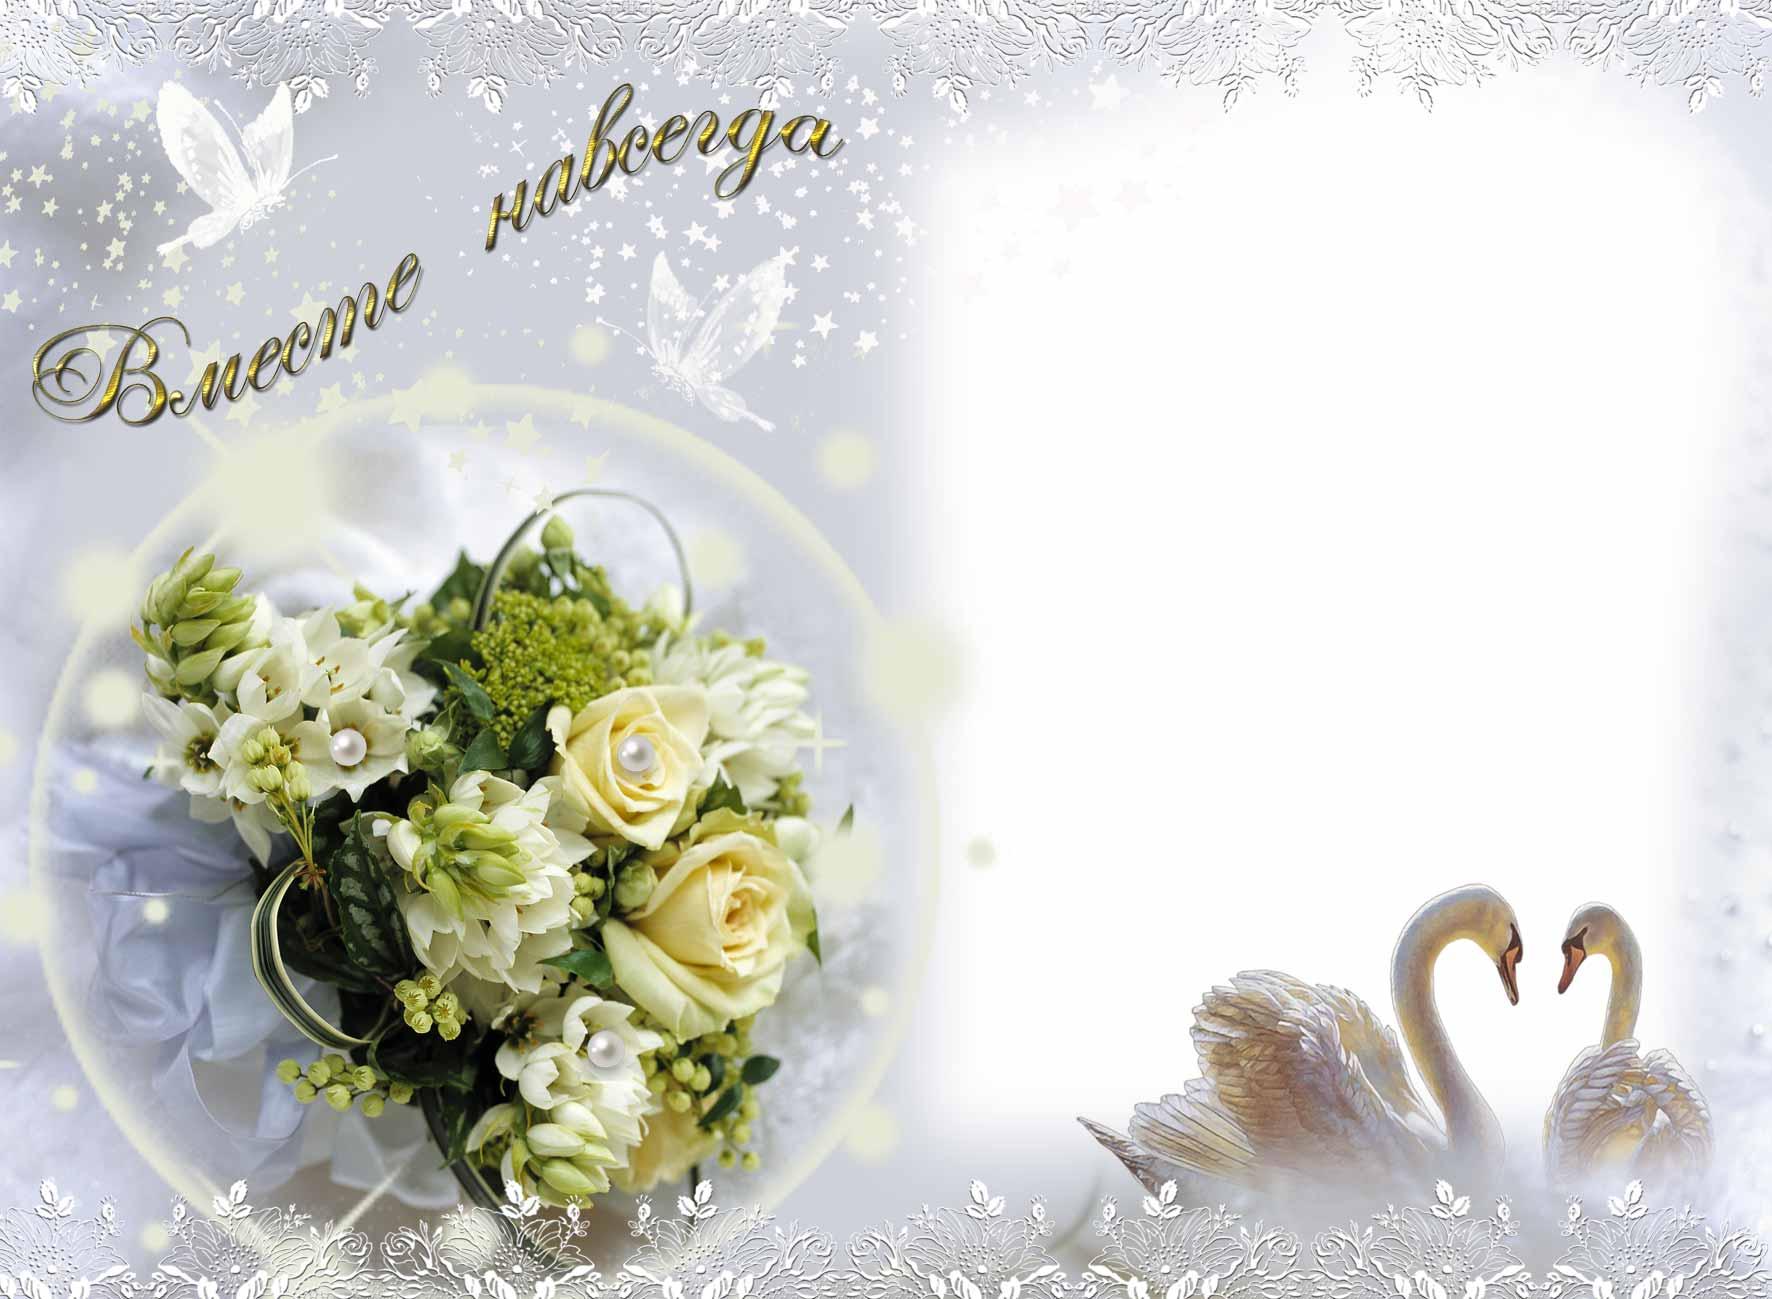 http://img-fotki.yandex.ru/get/9745/97761520.4b0/0_8f14c_7b196830_orig.jpg